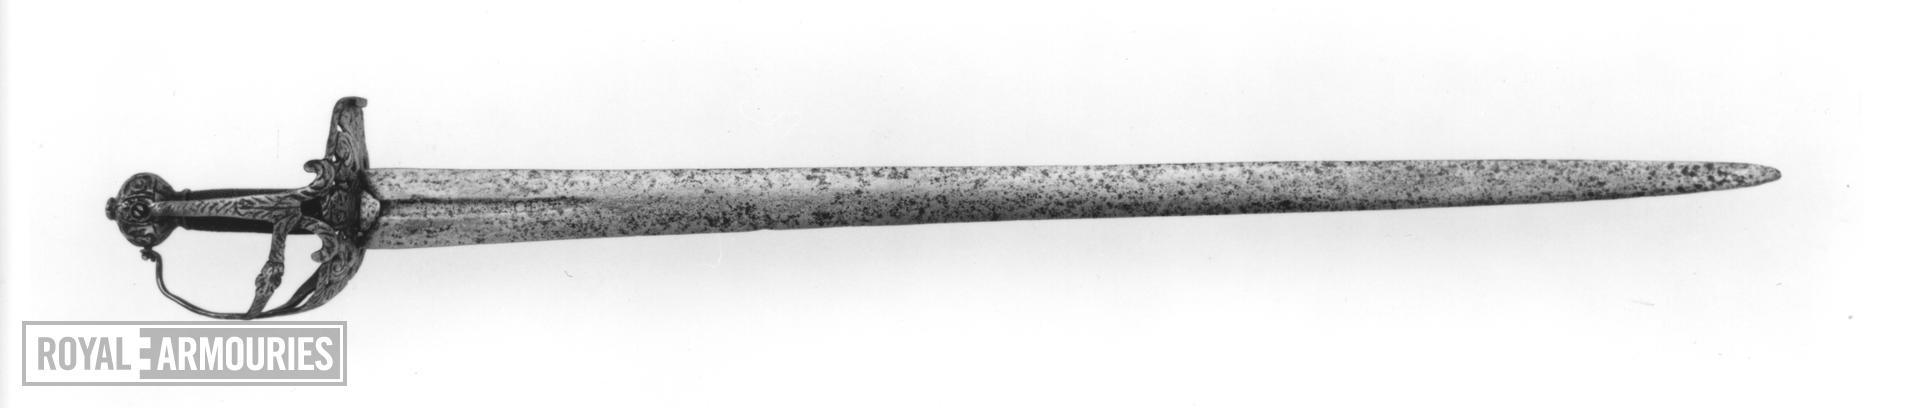 Sword Mortuary sword